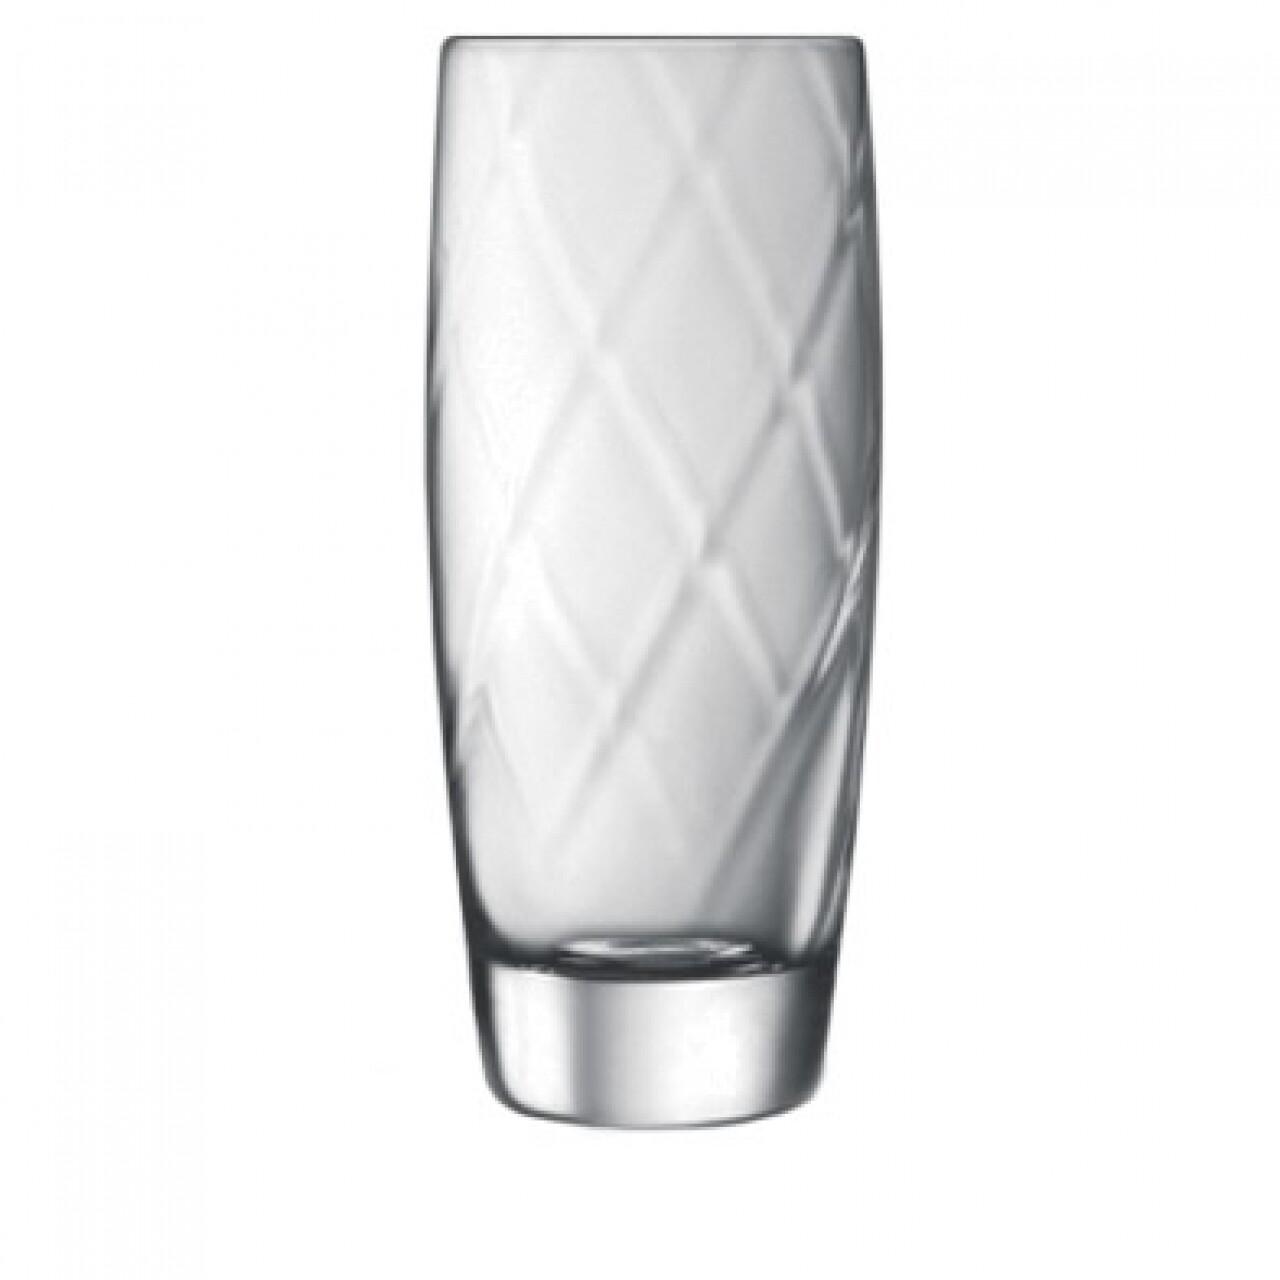 Set 4 pahare apa Canalleto, Luigi Bormioli, 443 ml, cristalit, transparent